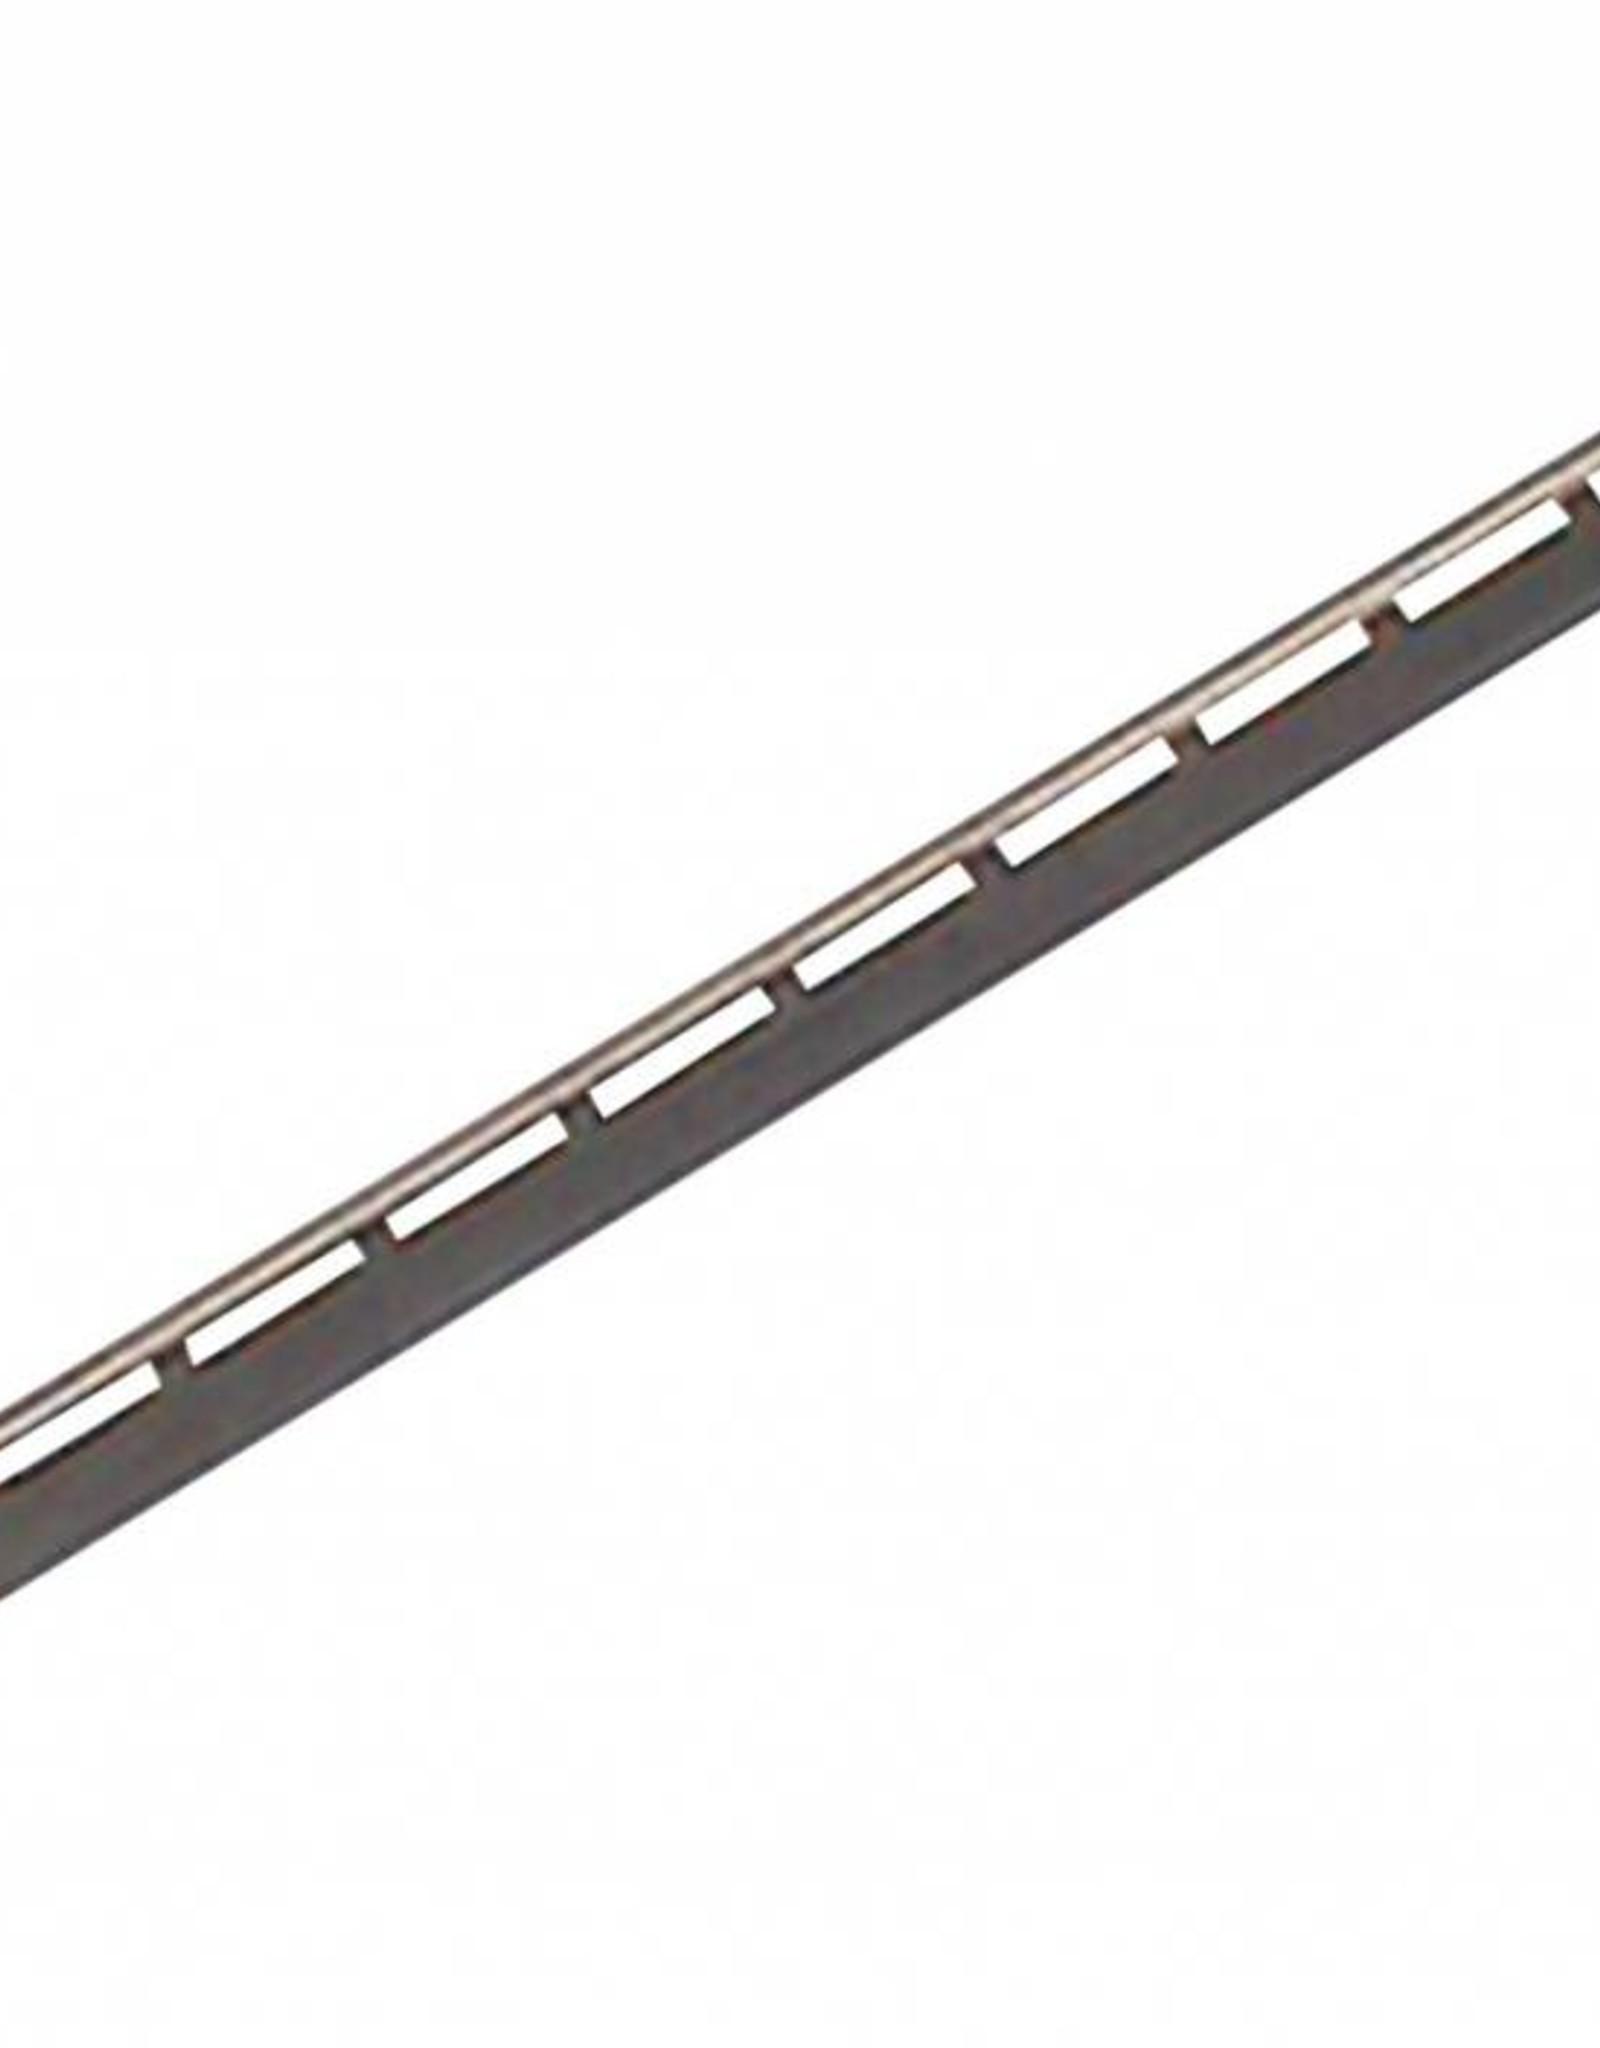 Unger S-Rail compleet met zacht rubber .